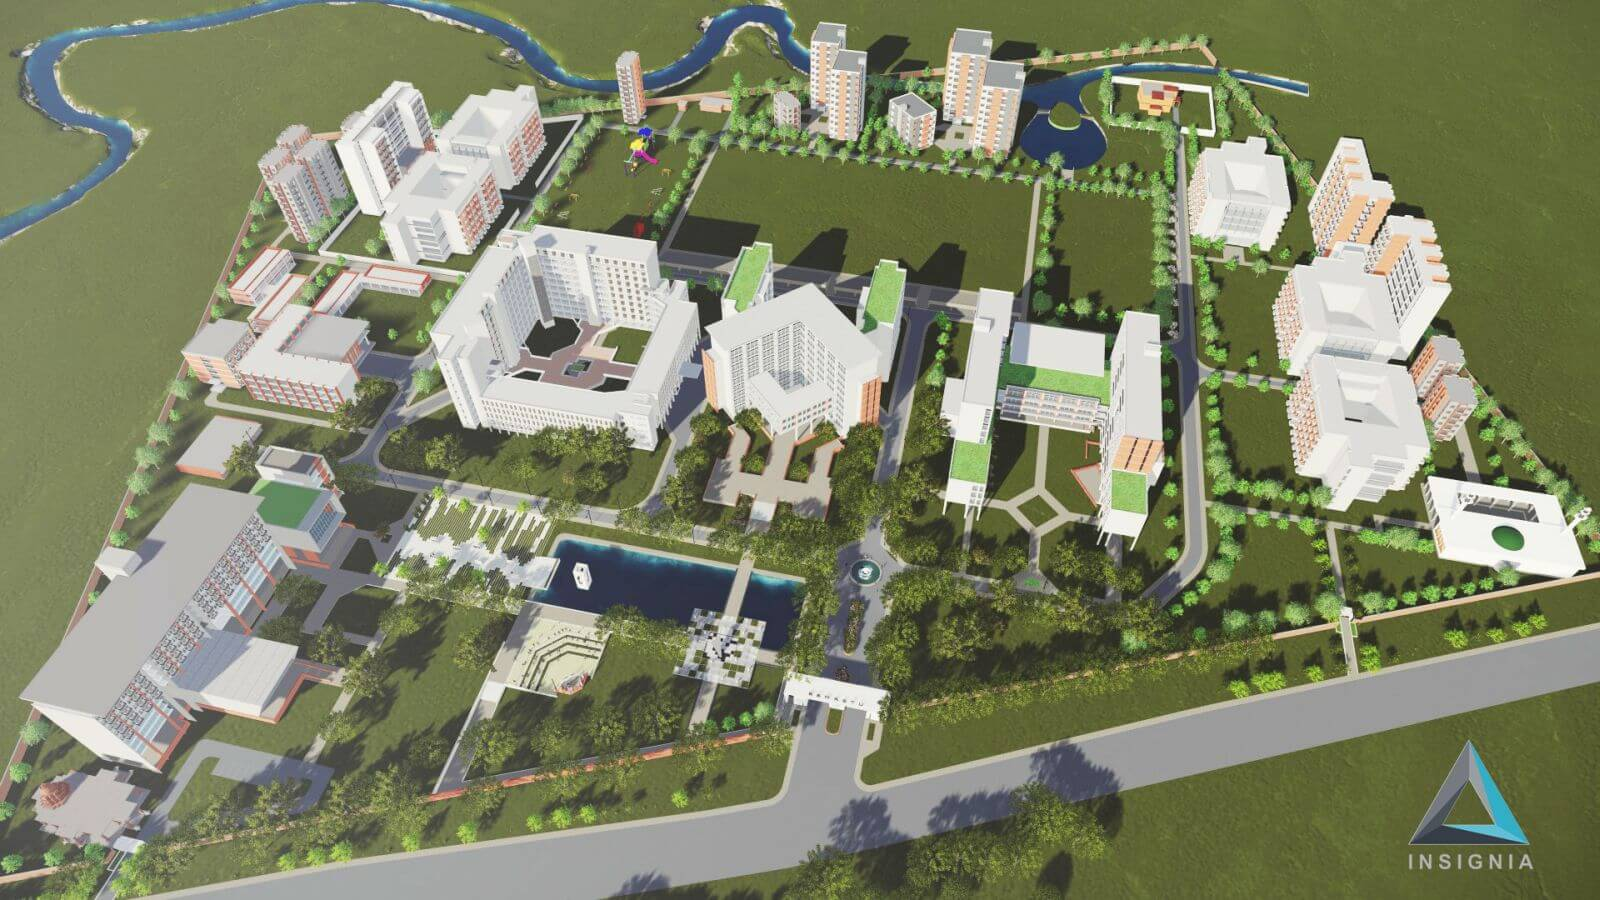 BSMRSTU Masterplan and Mural Complex